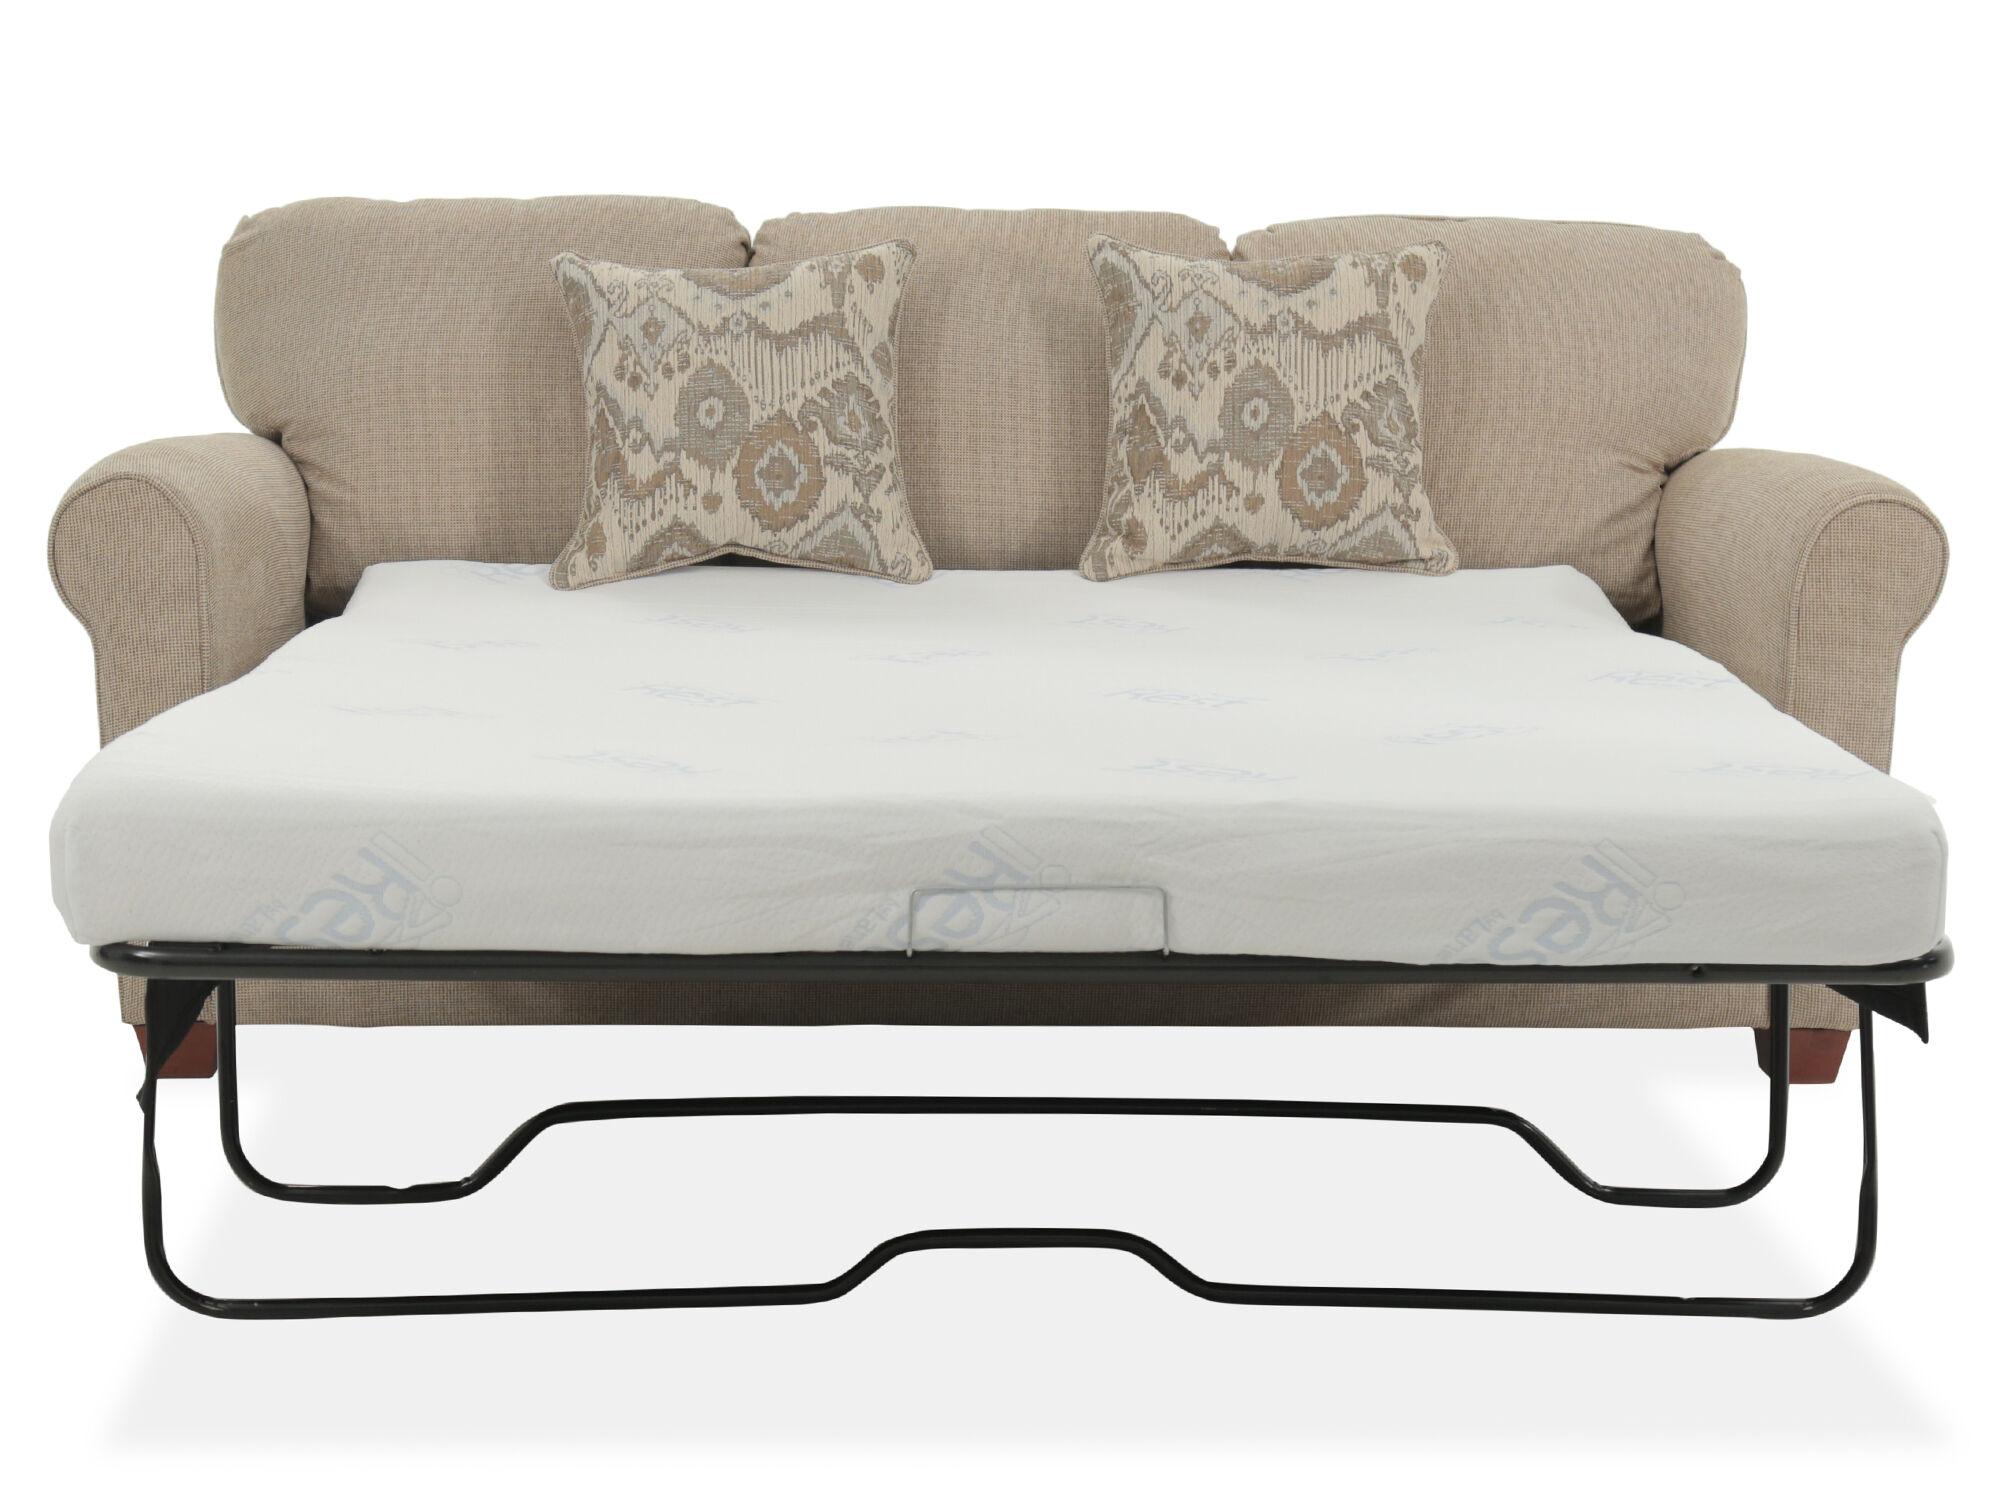 Roll Arm Transitional 84 Queen Sleeper Sofa